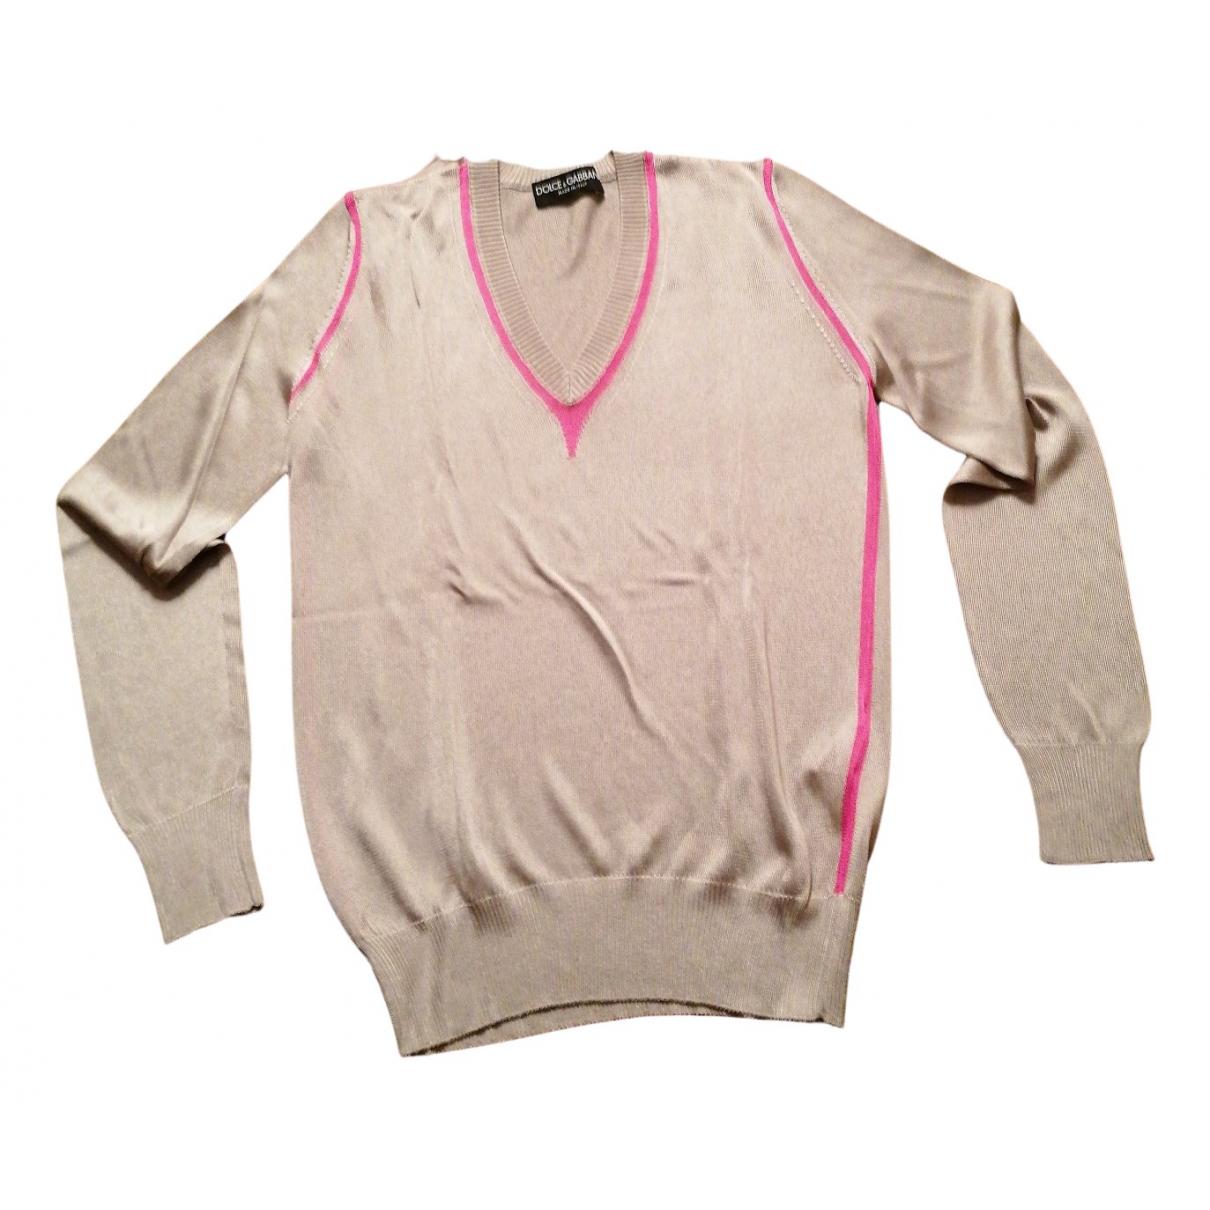 Dolce & Gabbana - Pull   pour femme - beige